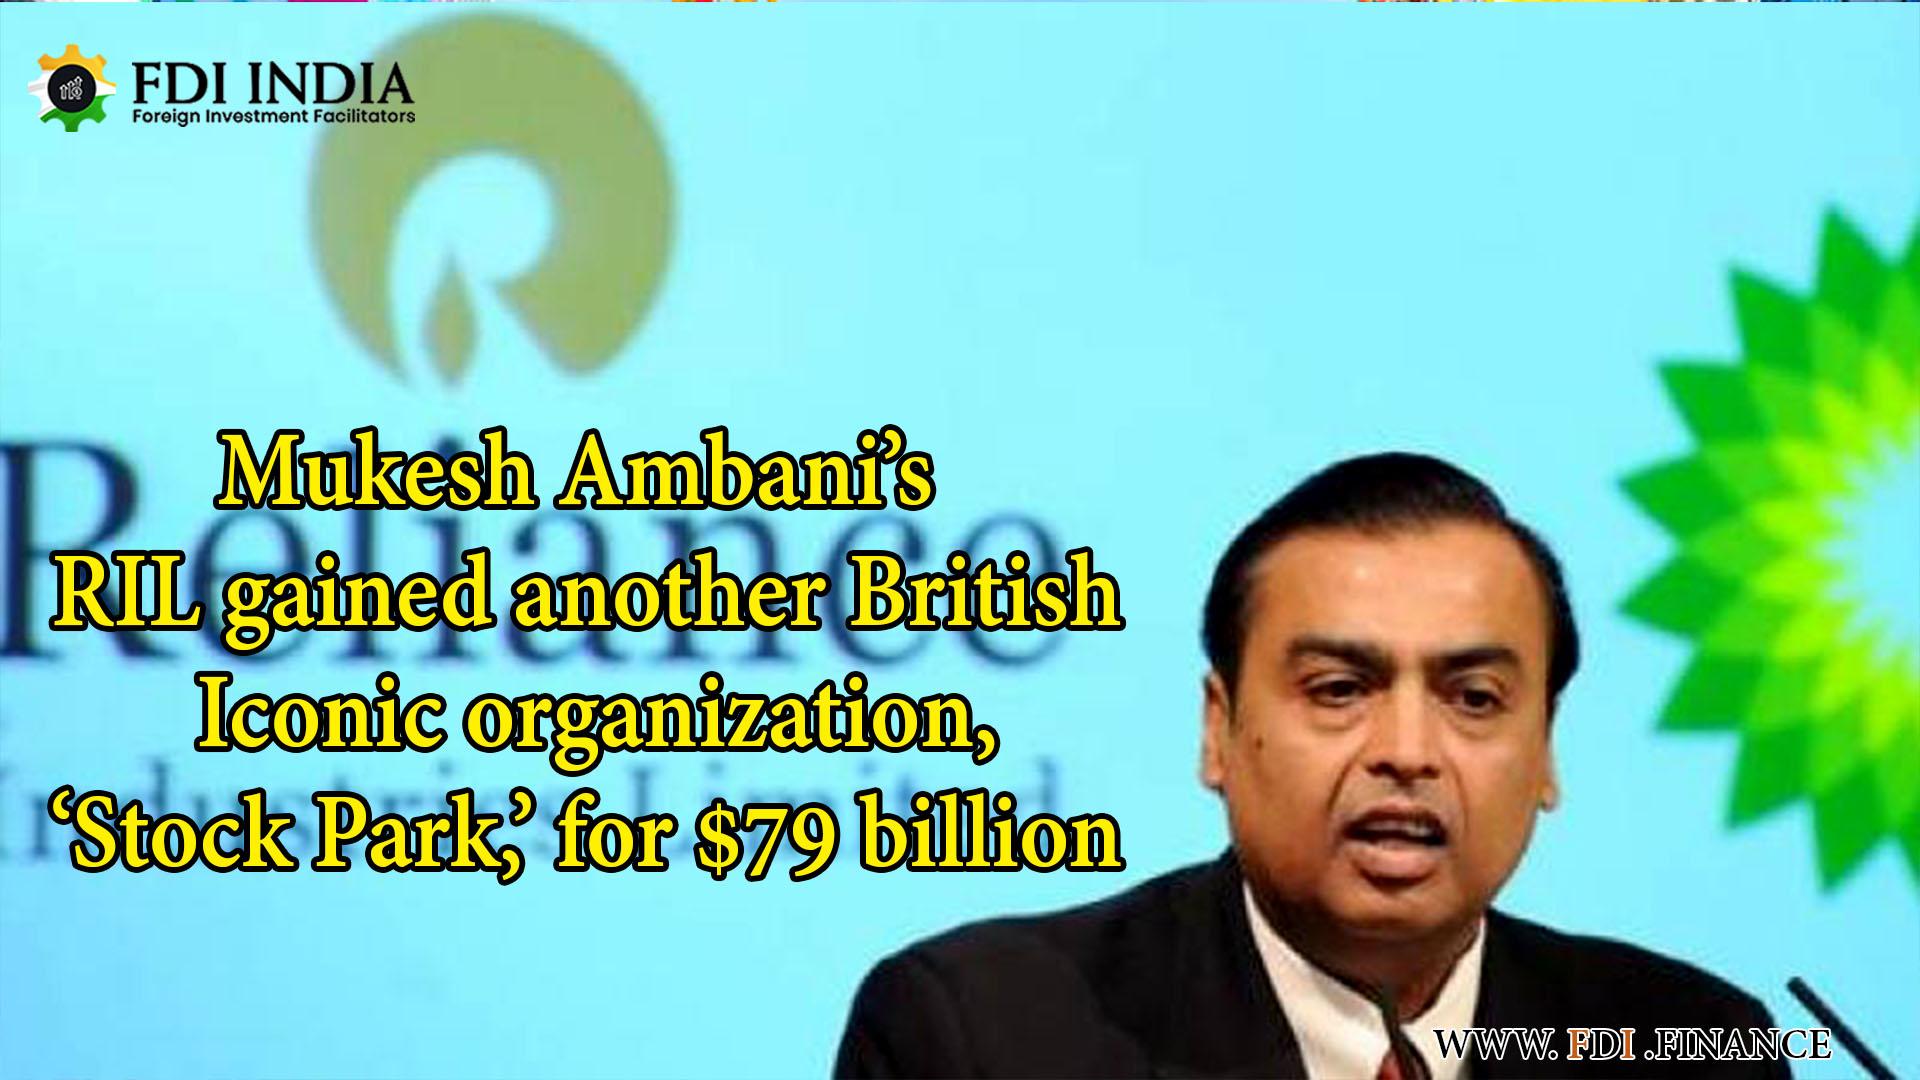 Mukesh Ambani's RIL Gained Another British Iconic Organization, 'Stock Park,' For $79 Billion